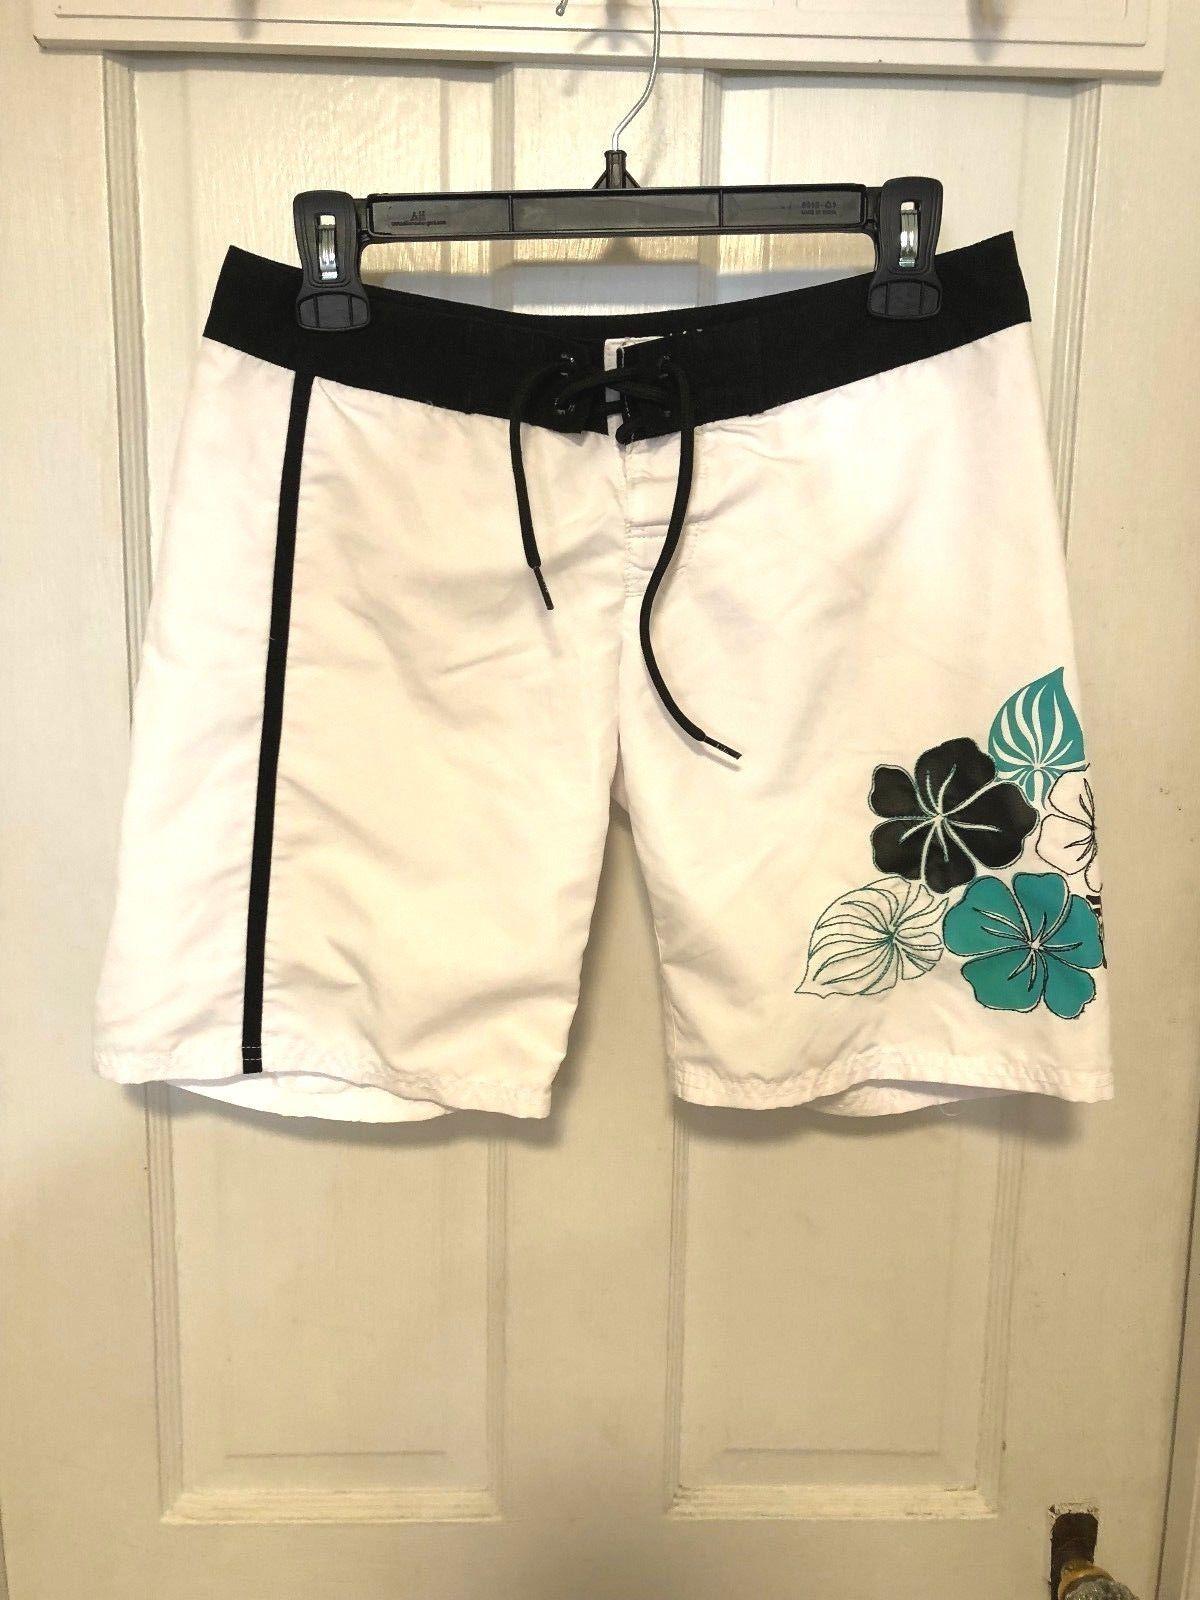 db5fc26f53 LILU Boy's Swimming Trunks White w Black and 50 similar items